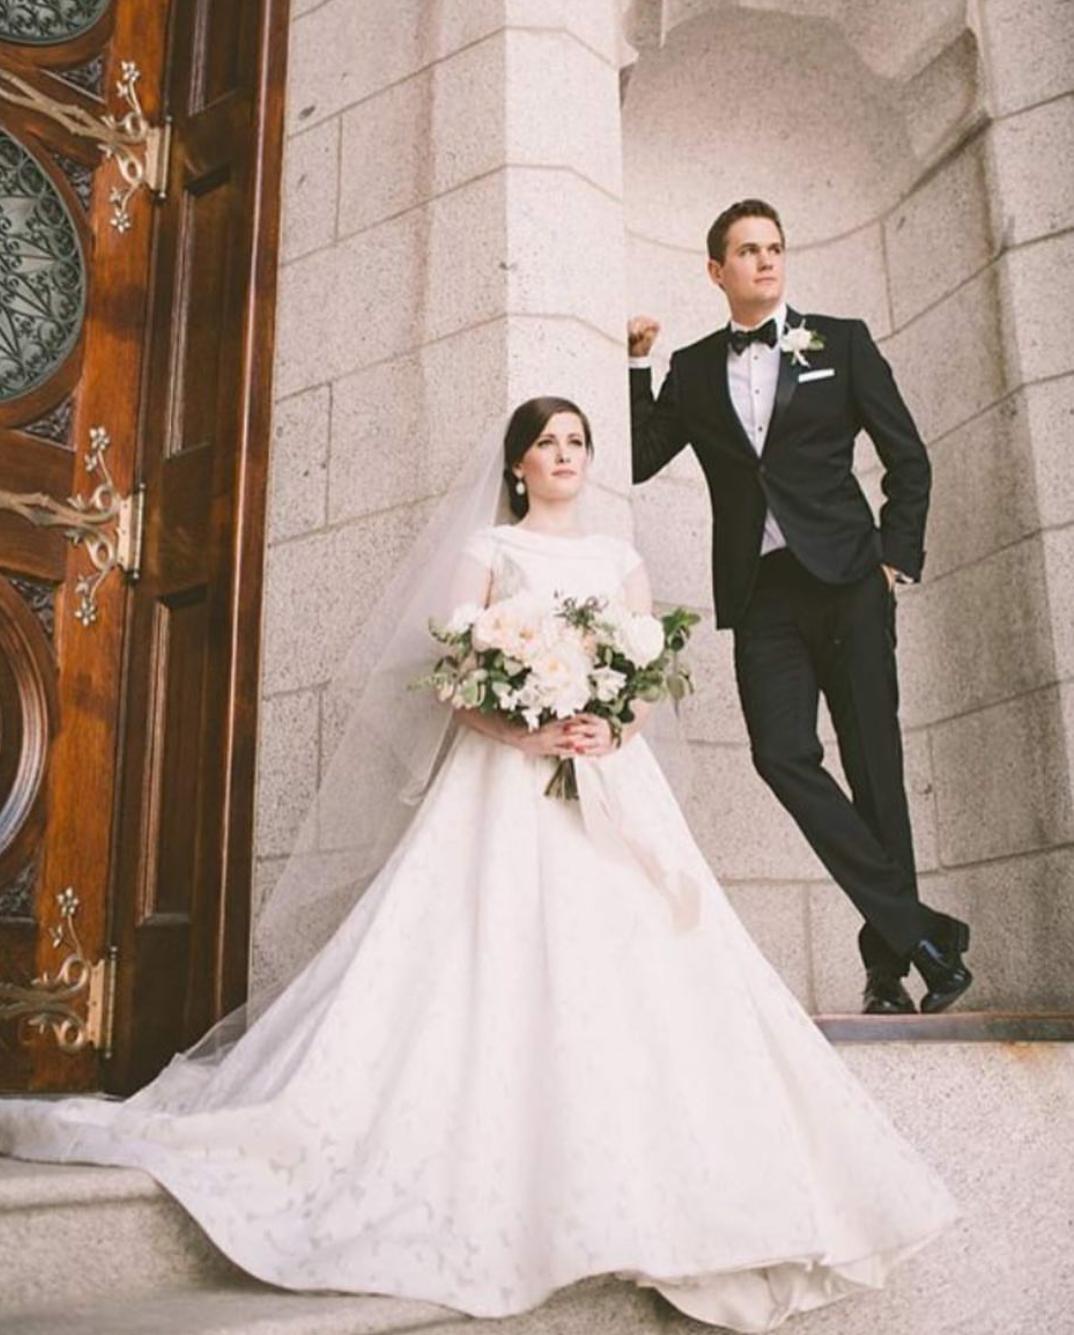 Wedding dresses com  modest wedding dress with cap sleeves from alta moda  modest